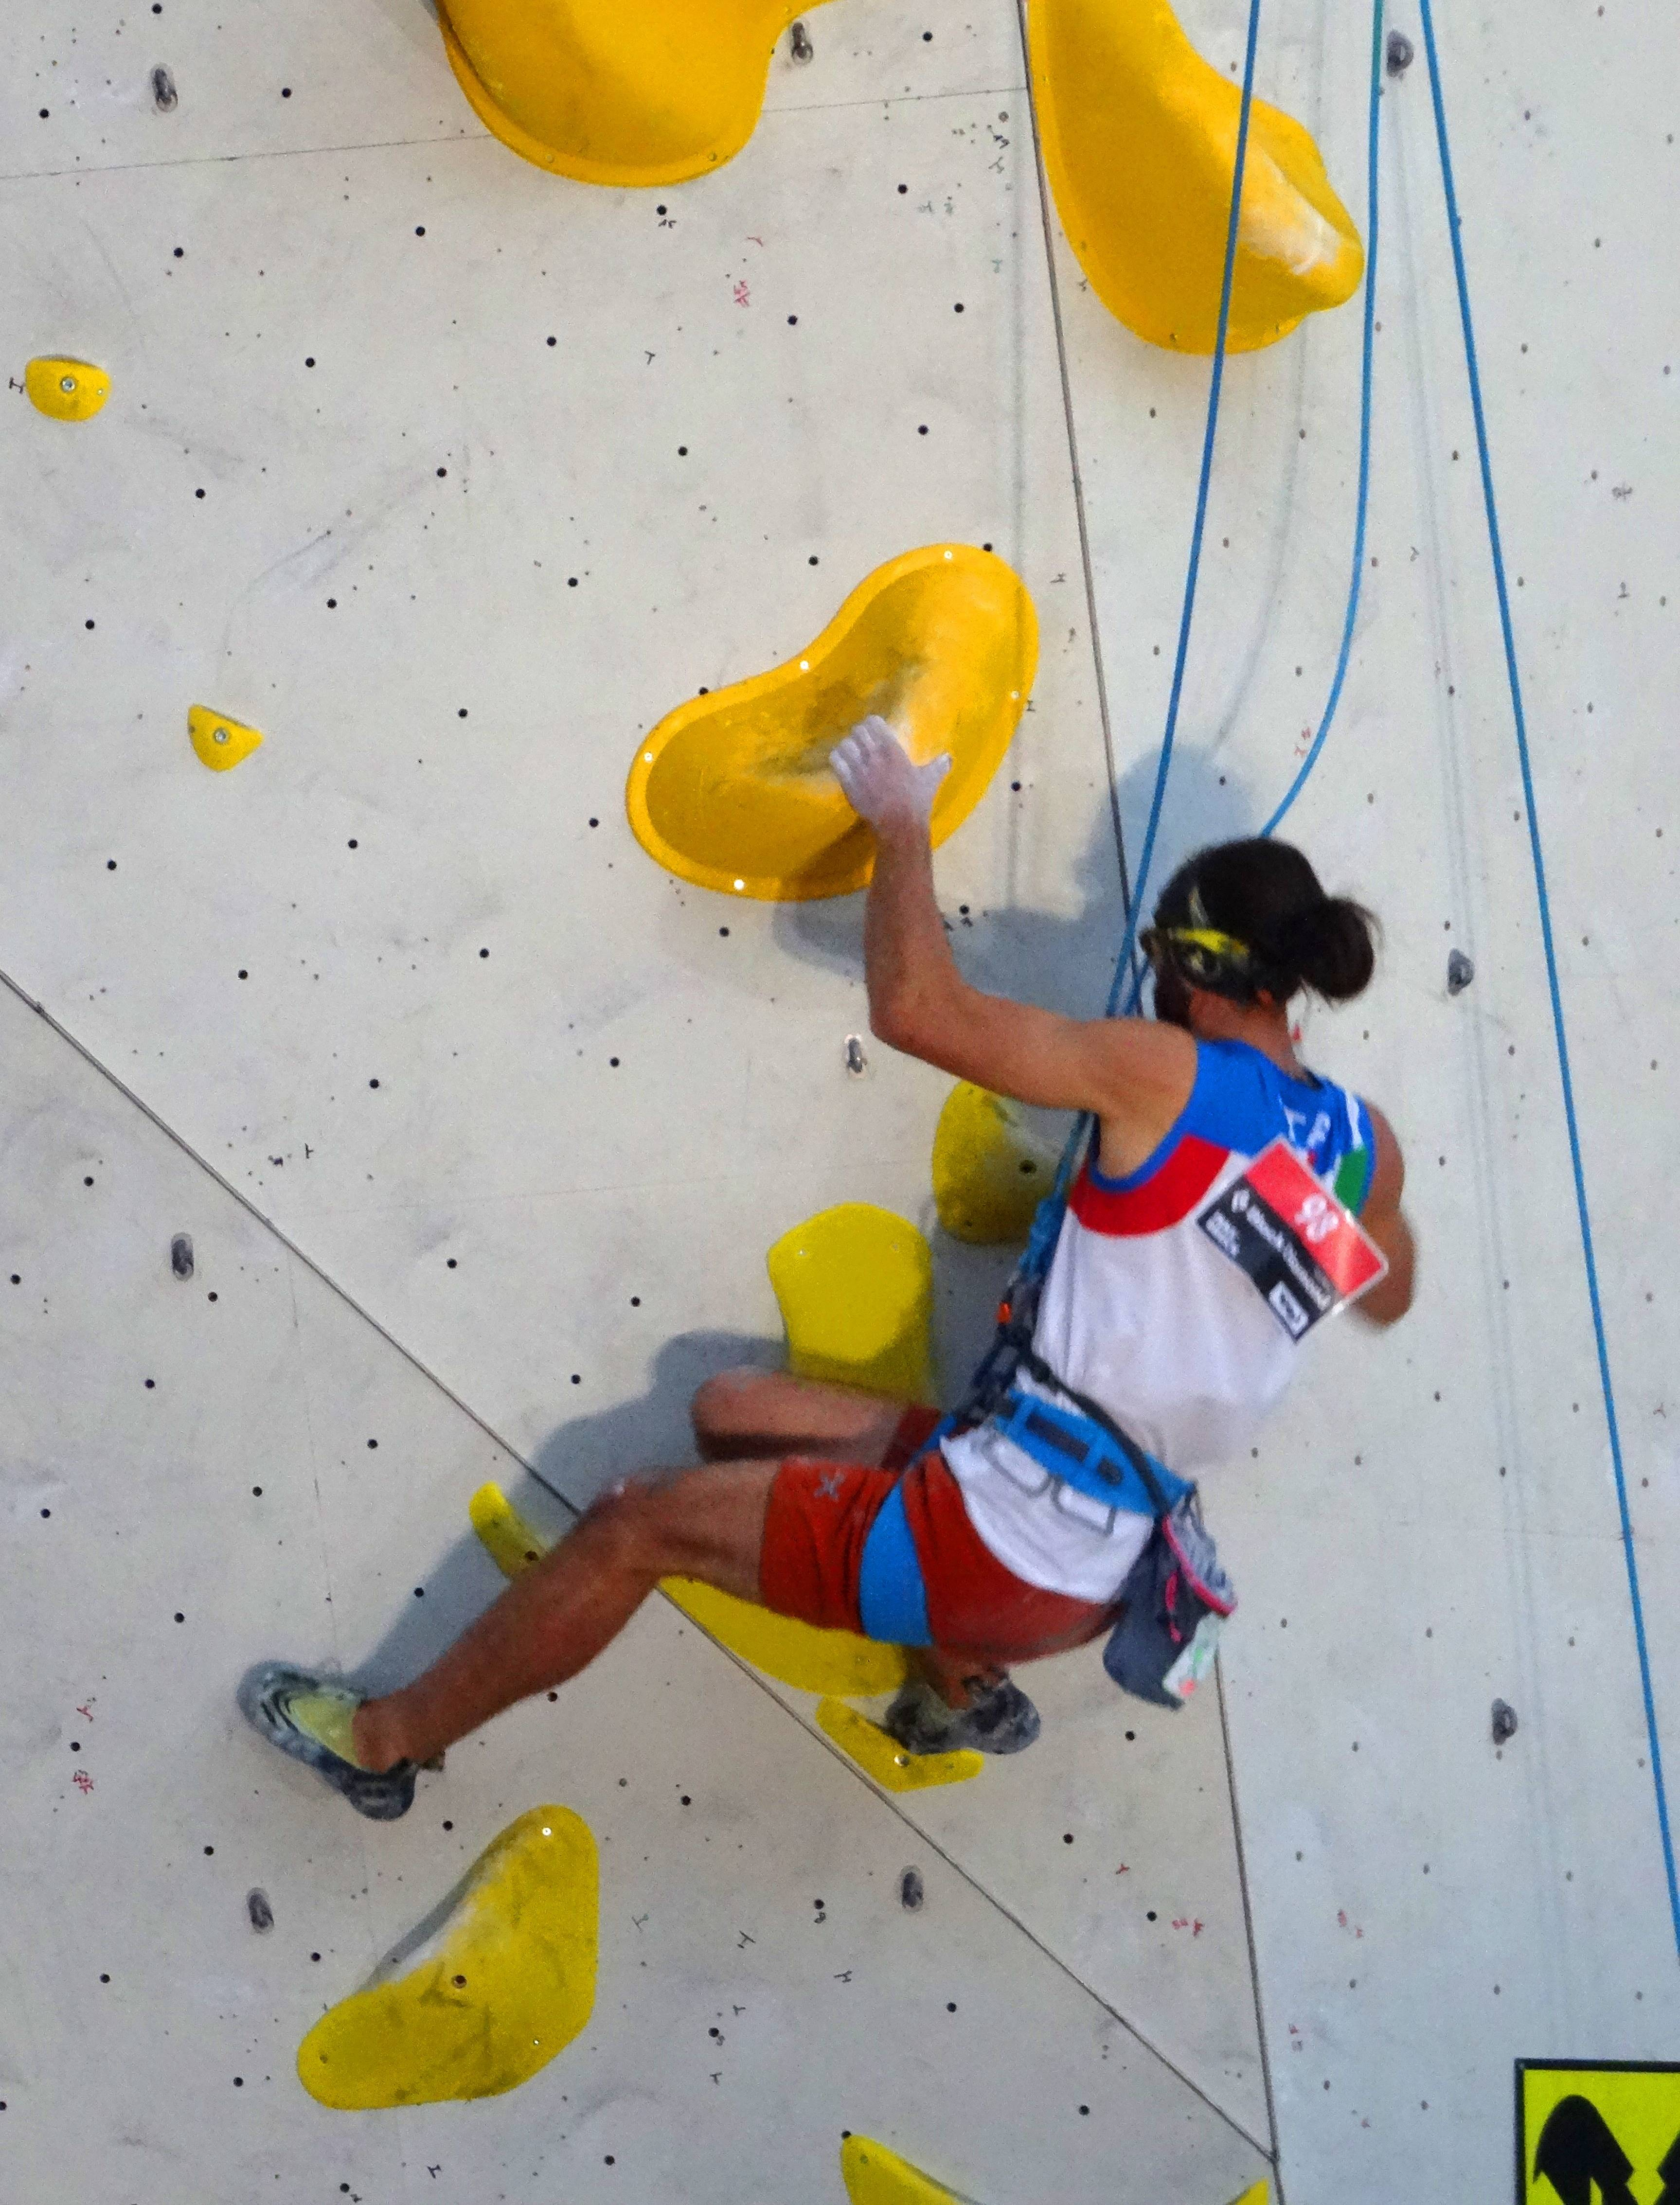 matteo stefani milano climbing expo urba wall